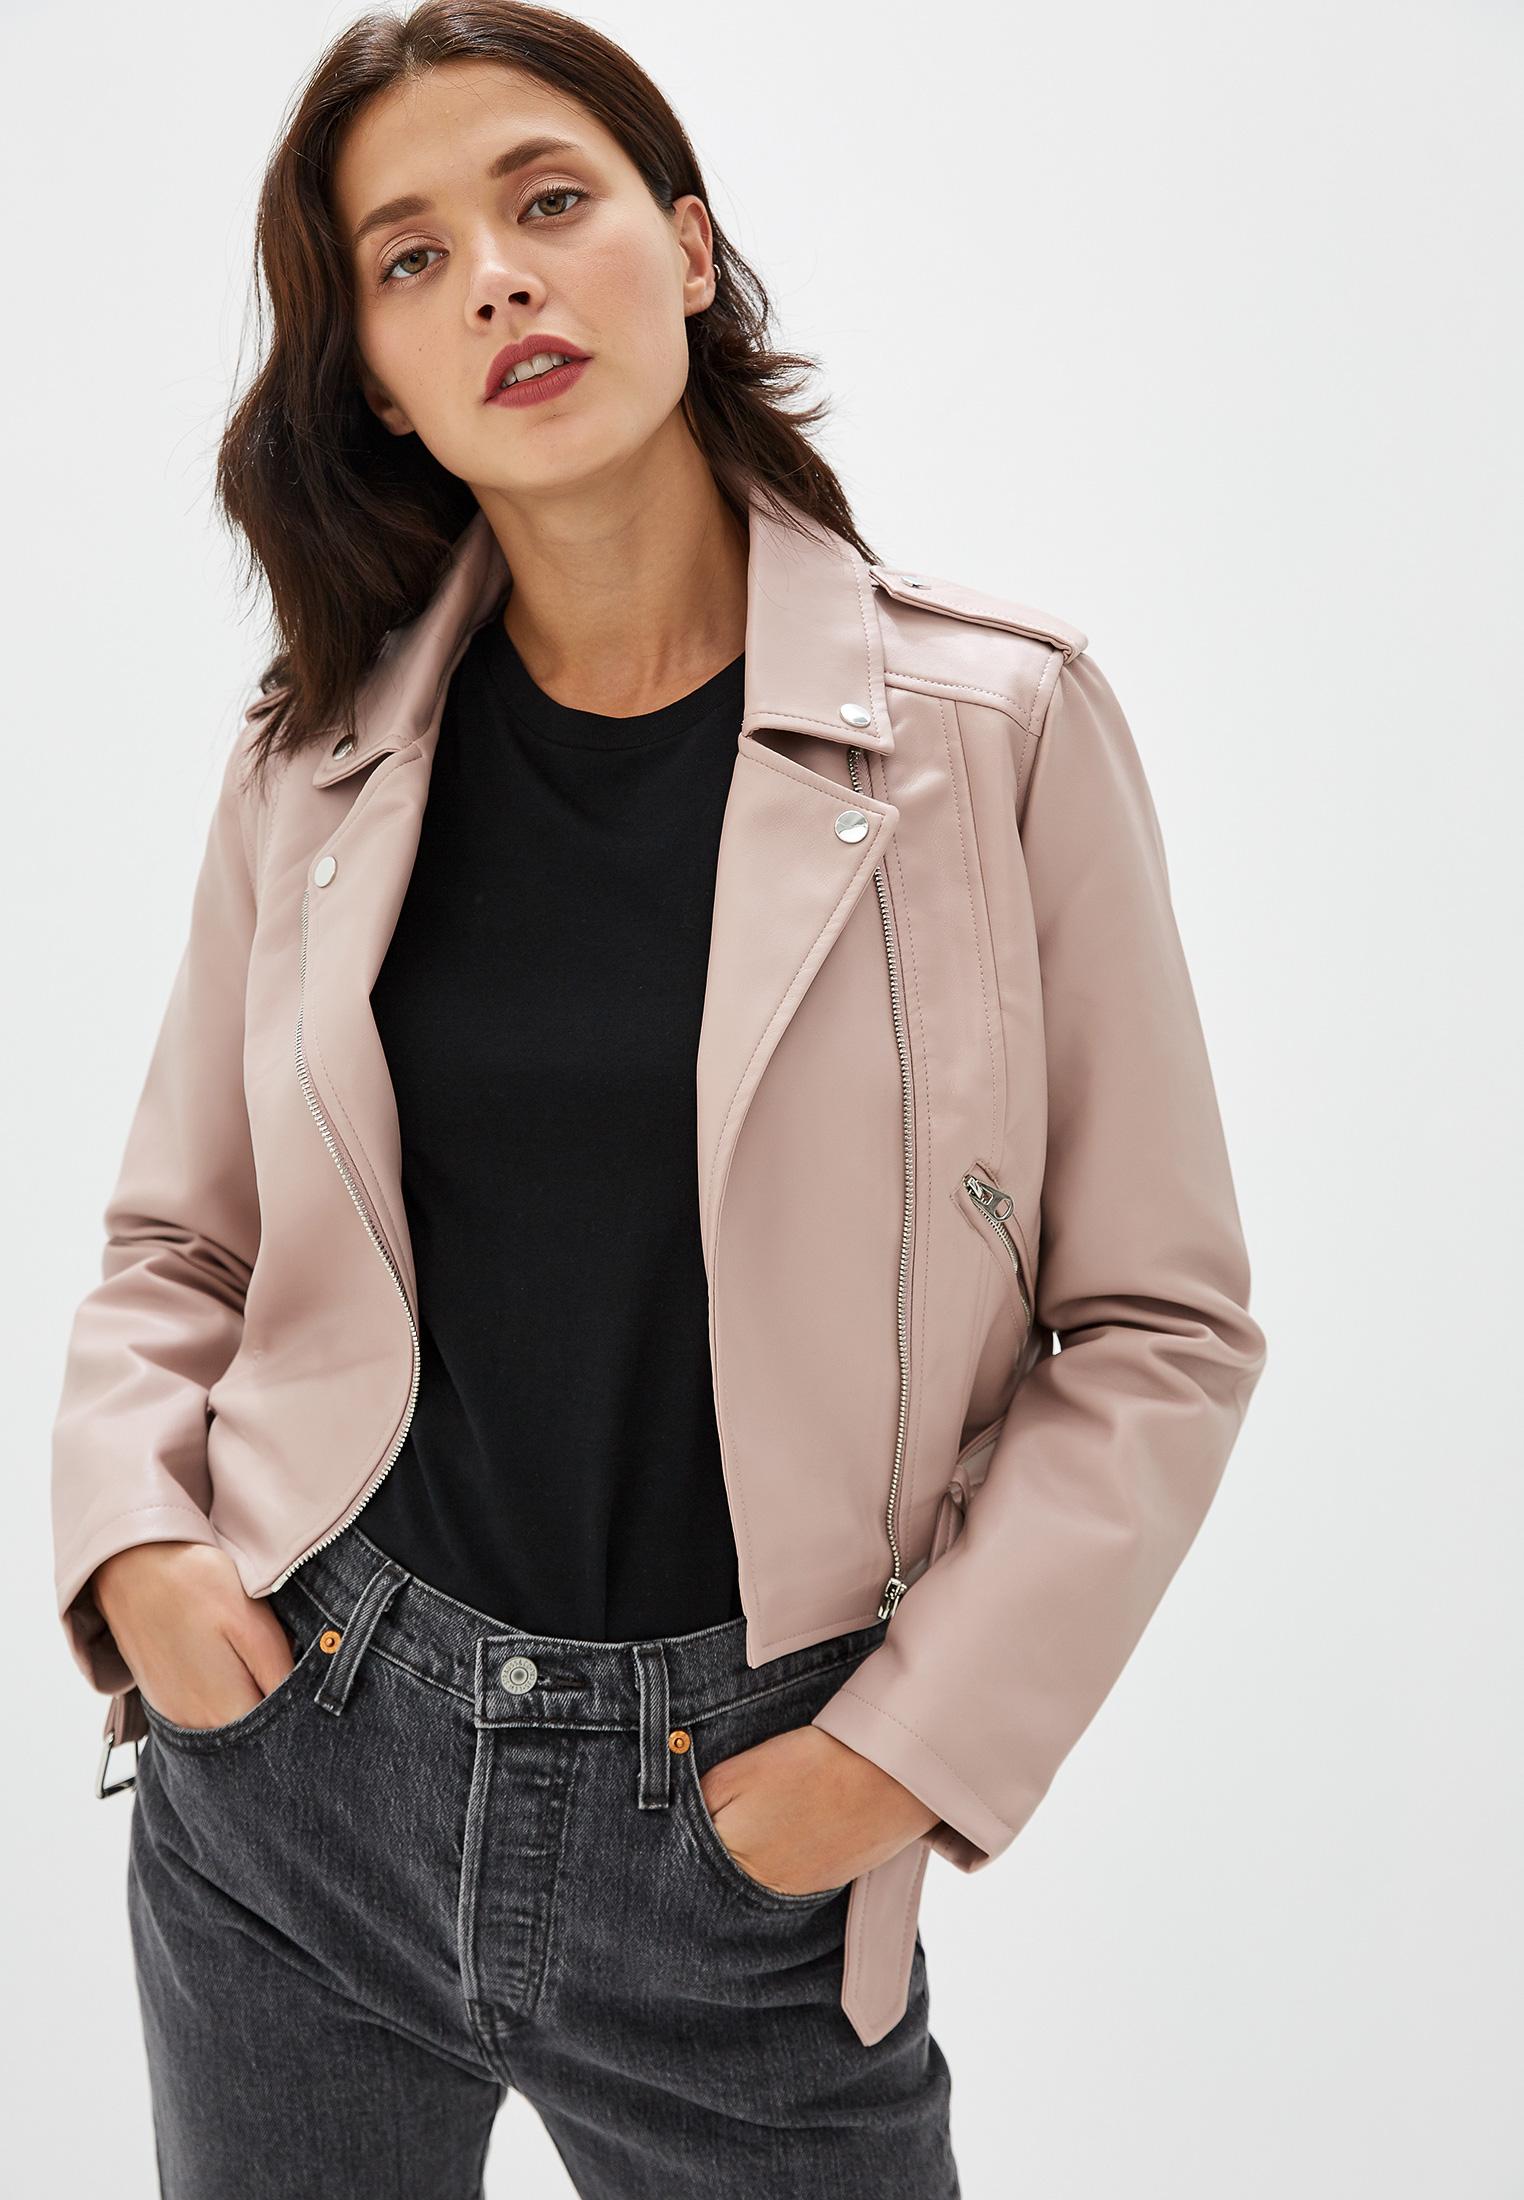 Куртка кожаная, Befree, цвет: розовый. Артикул: MP002XW0RE1P. Одежда / Верхняя одежда / Косухи